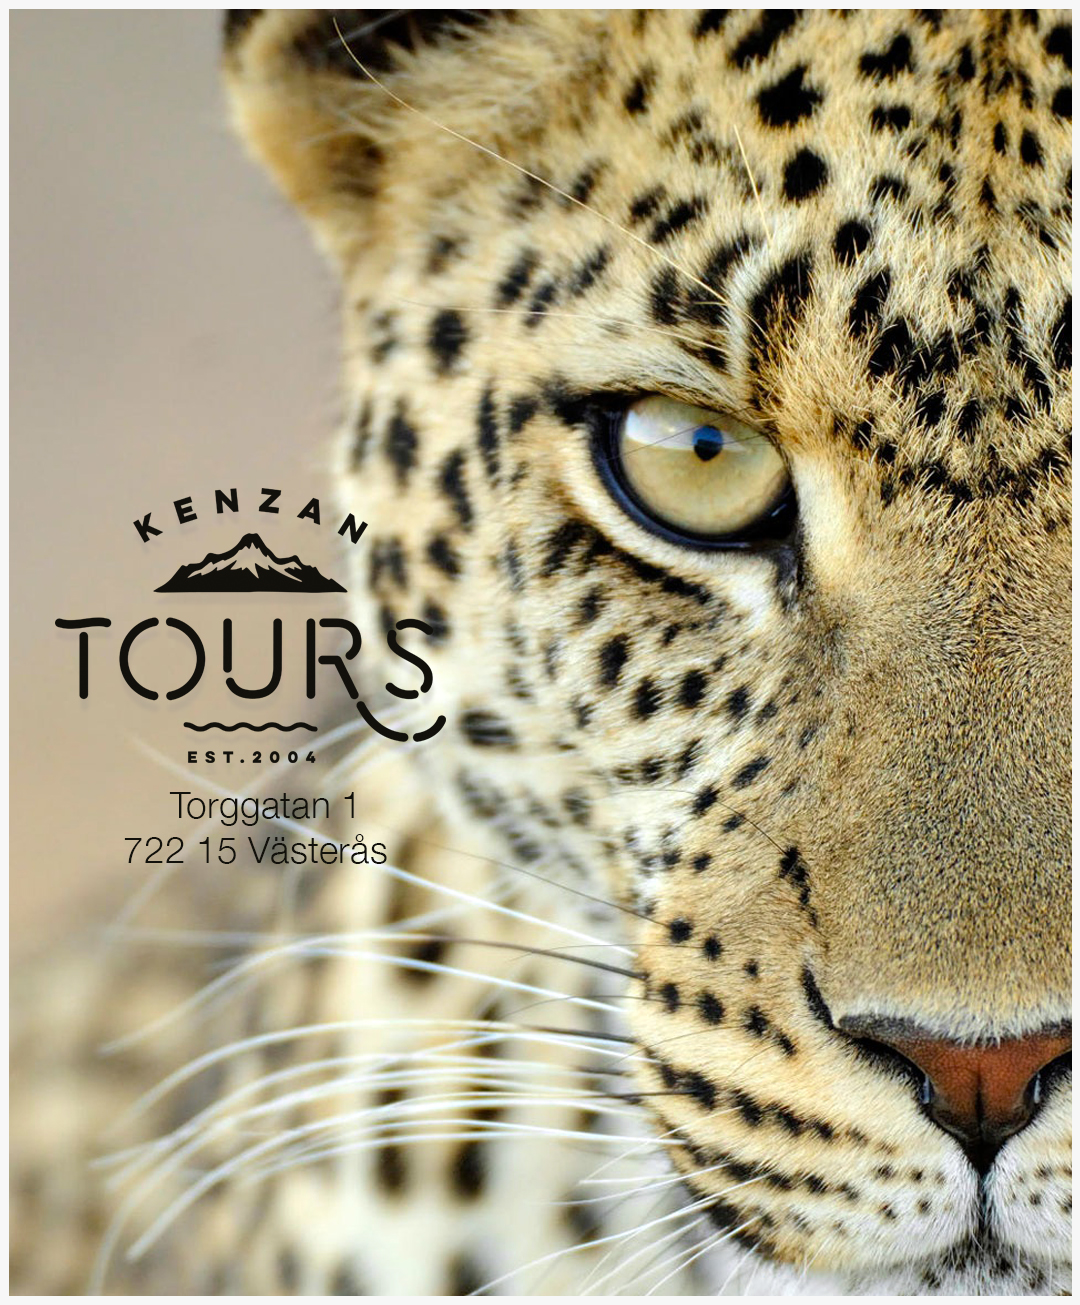 kenzan-tanzania- Businesschannel.se .jpg